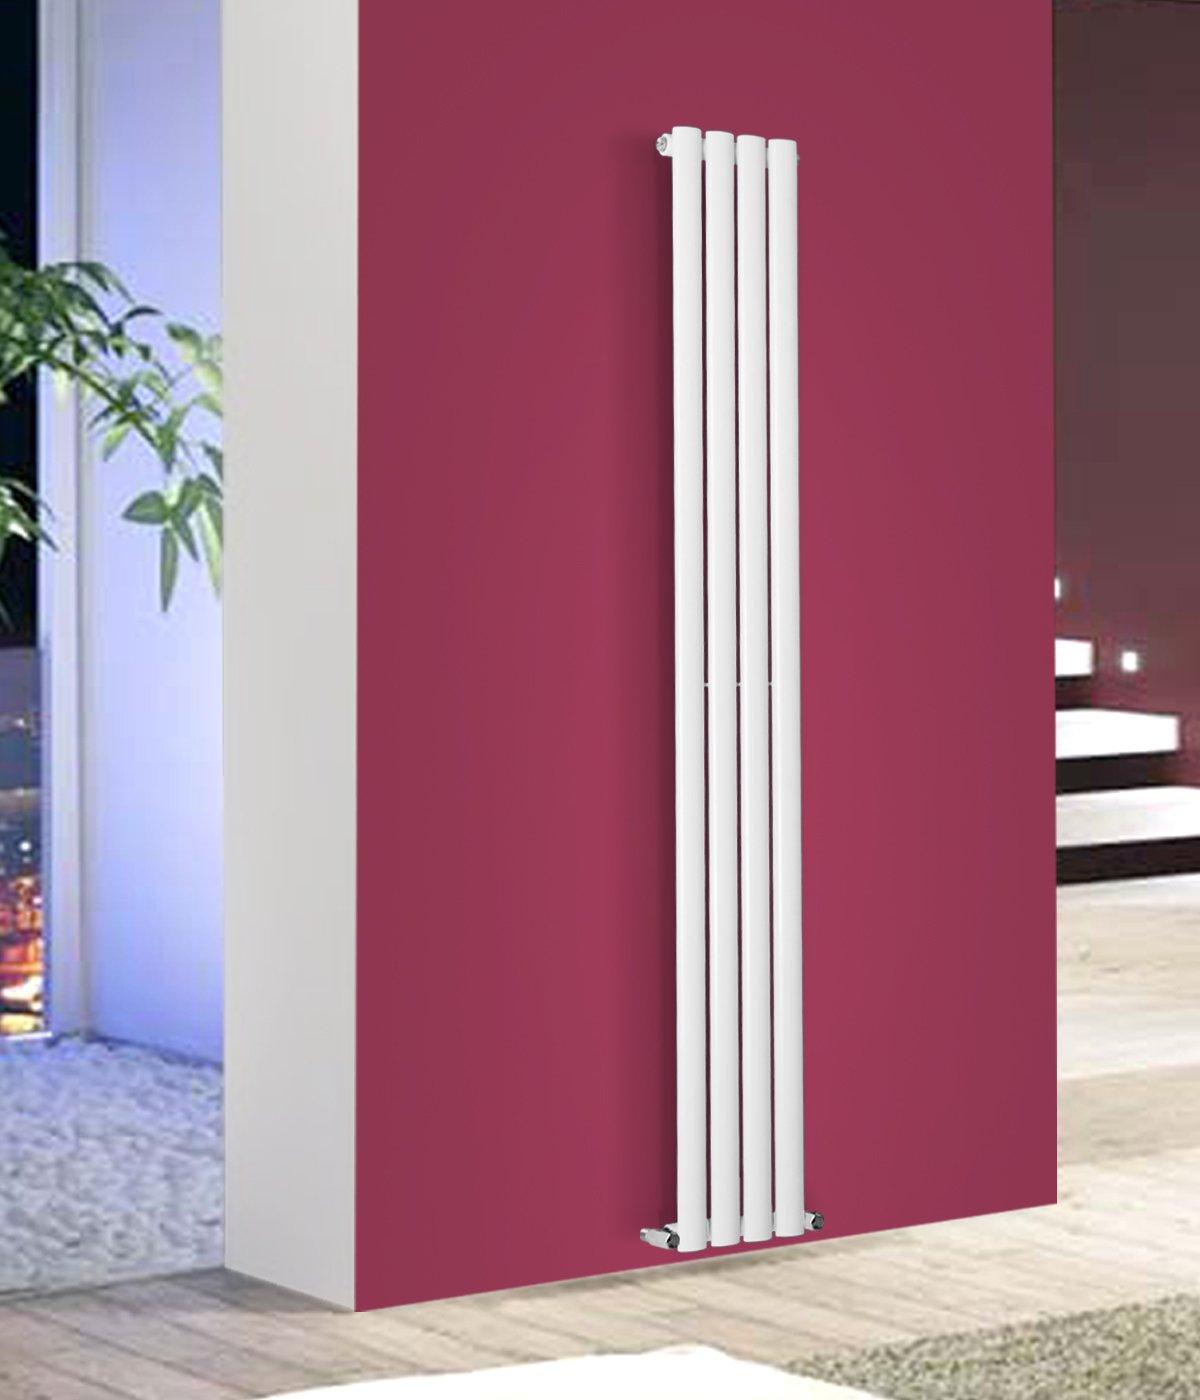 Design Heizkã¶rper Horizontal | Nrg Heizkorper Fur Zentralheizung Einzelpaneel Vertikal Oval